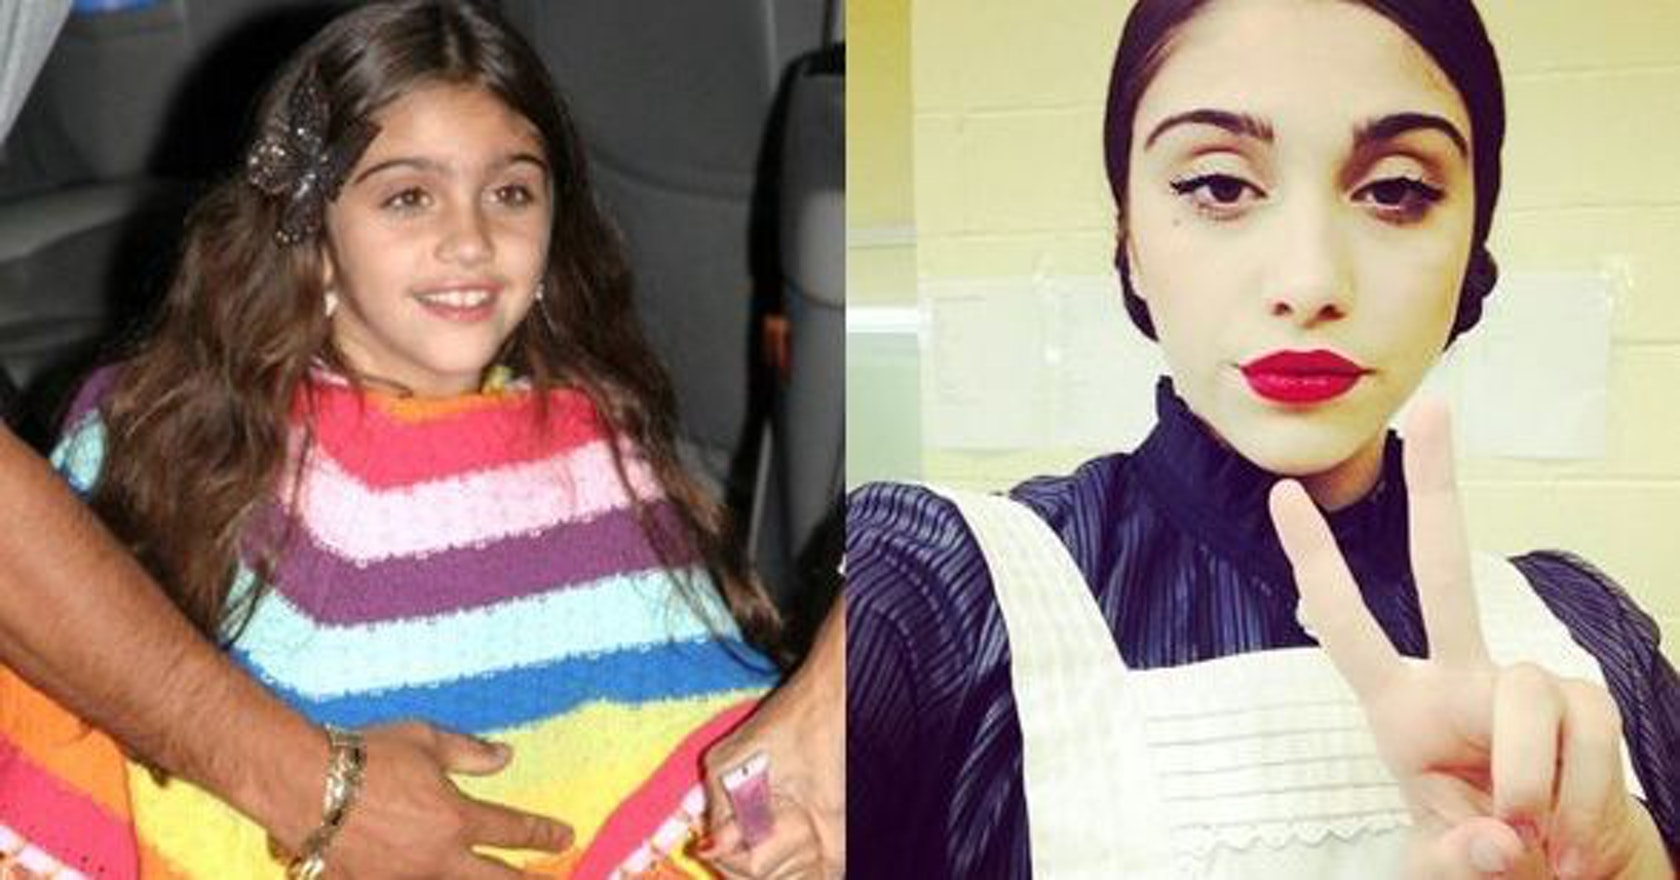 Celebrity children, all grown up: from Lourdes to Brooklyn Beckham